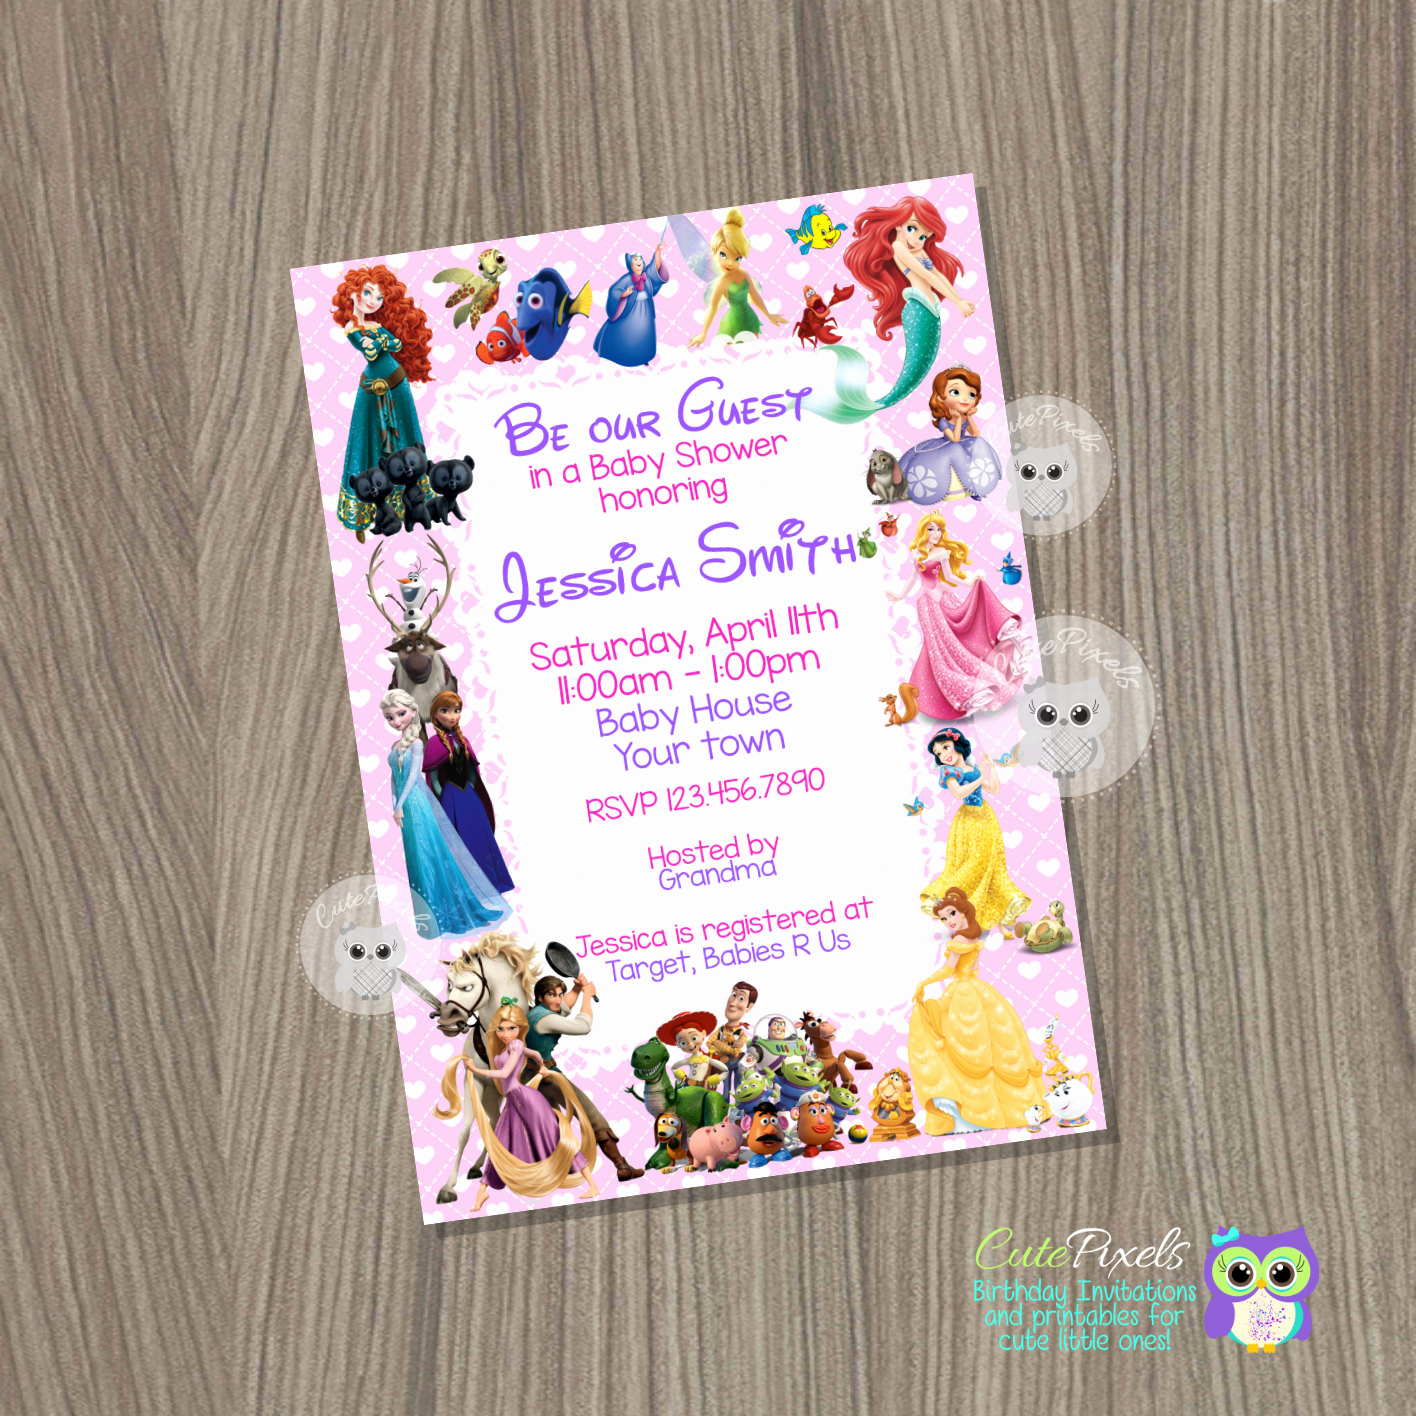 Disney Baby Shower Invitations Luxury Baby Shower Invitation for Girl Disney Baby Shower Baby Girl